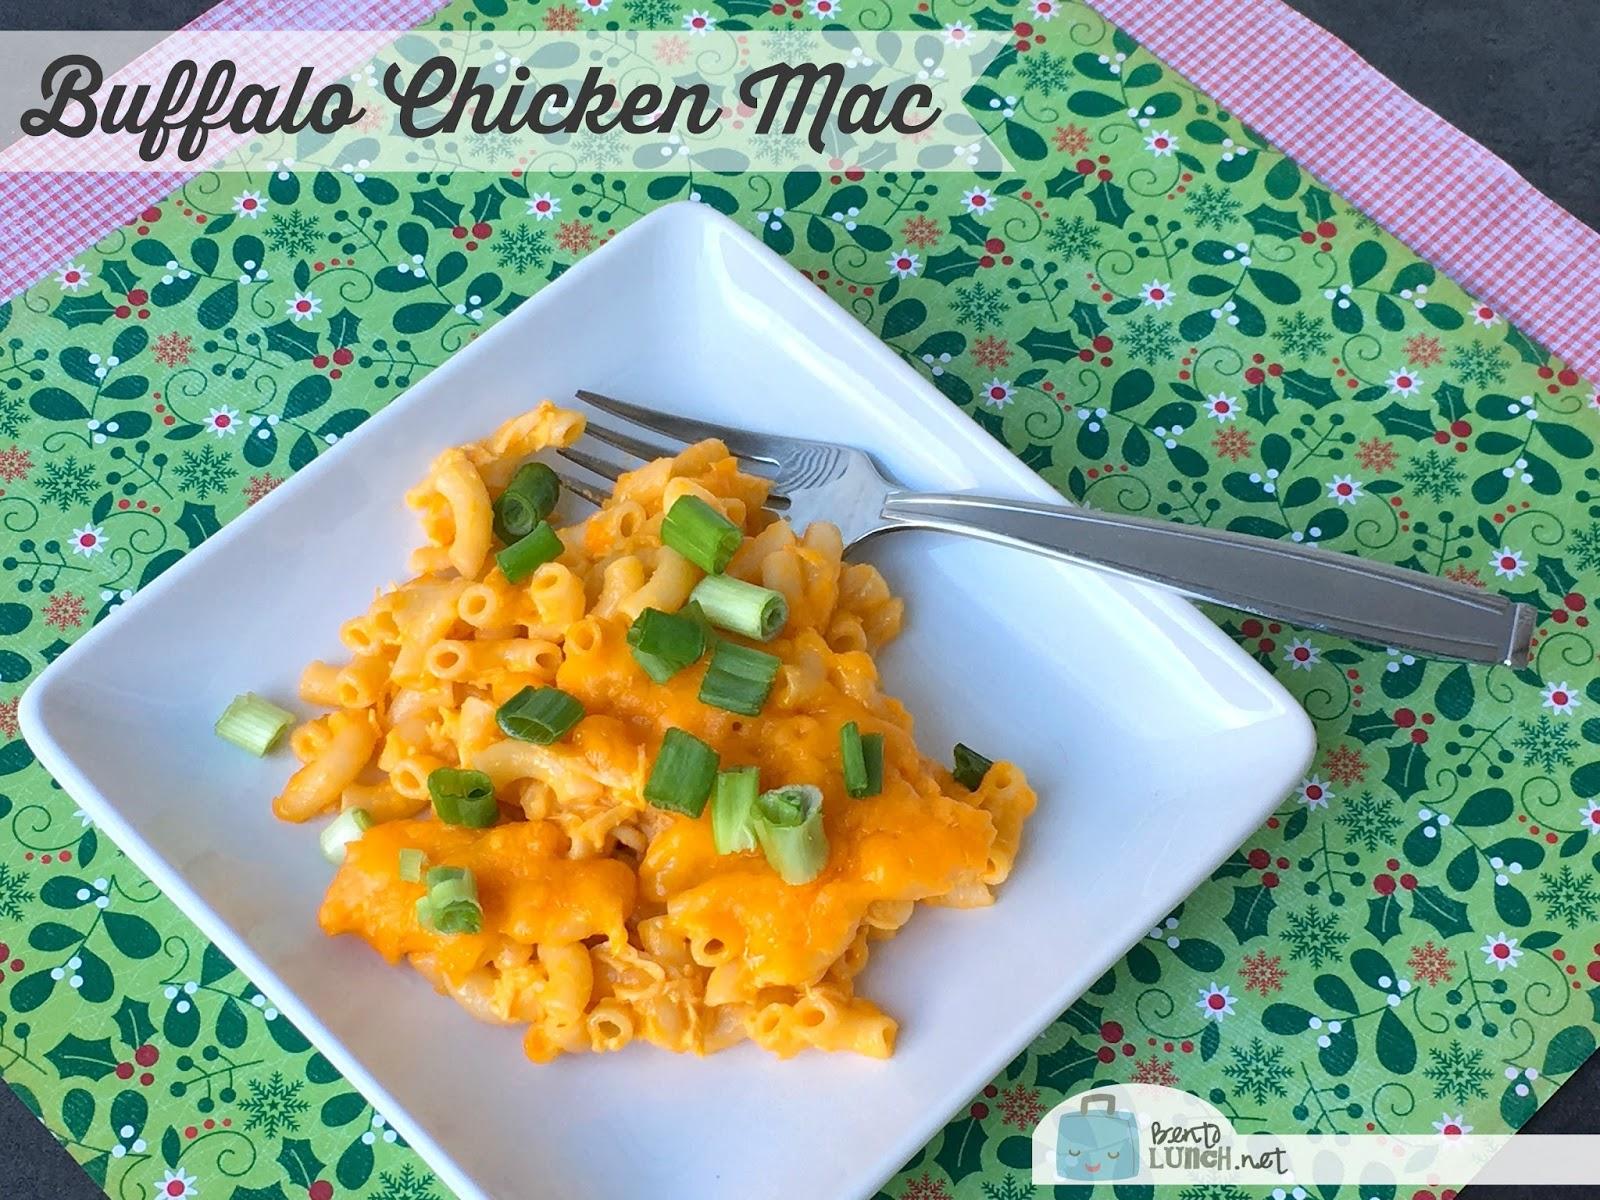 Buffalo Chicken Mac Cookingupholidays